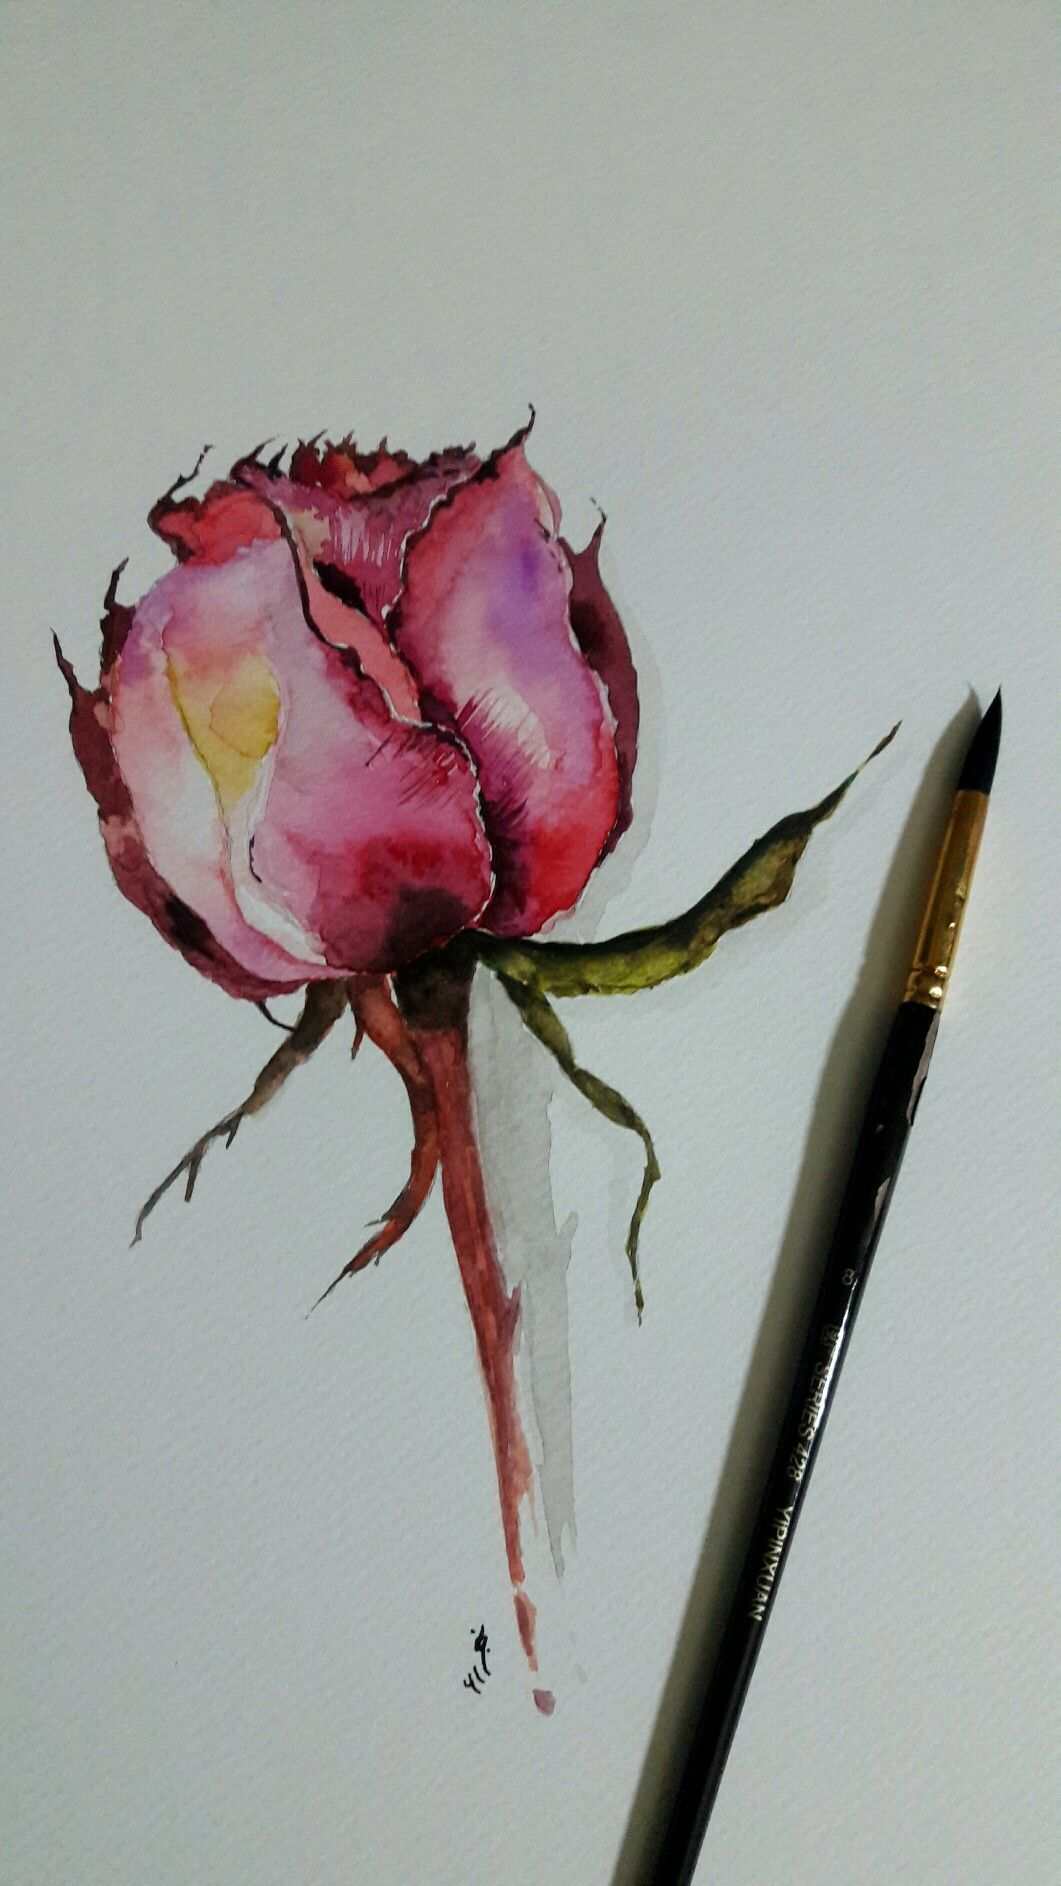 Pin By نجلاء حسين On رسمي Watercolor Paintings Drawings Color Blending